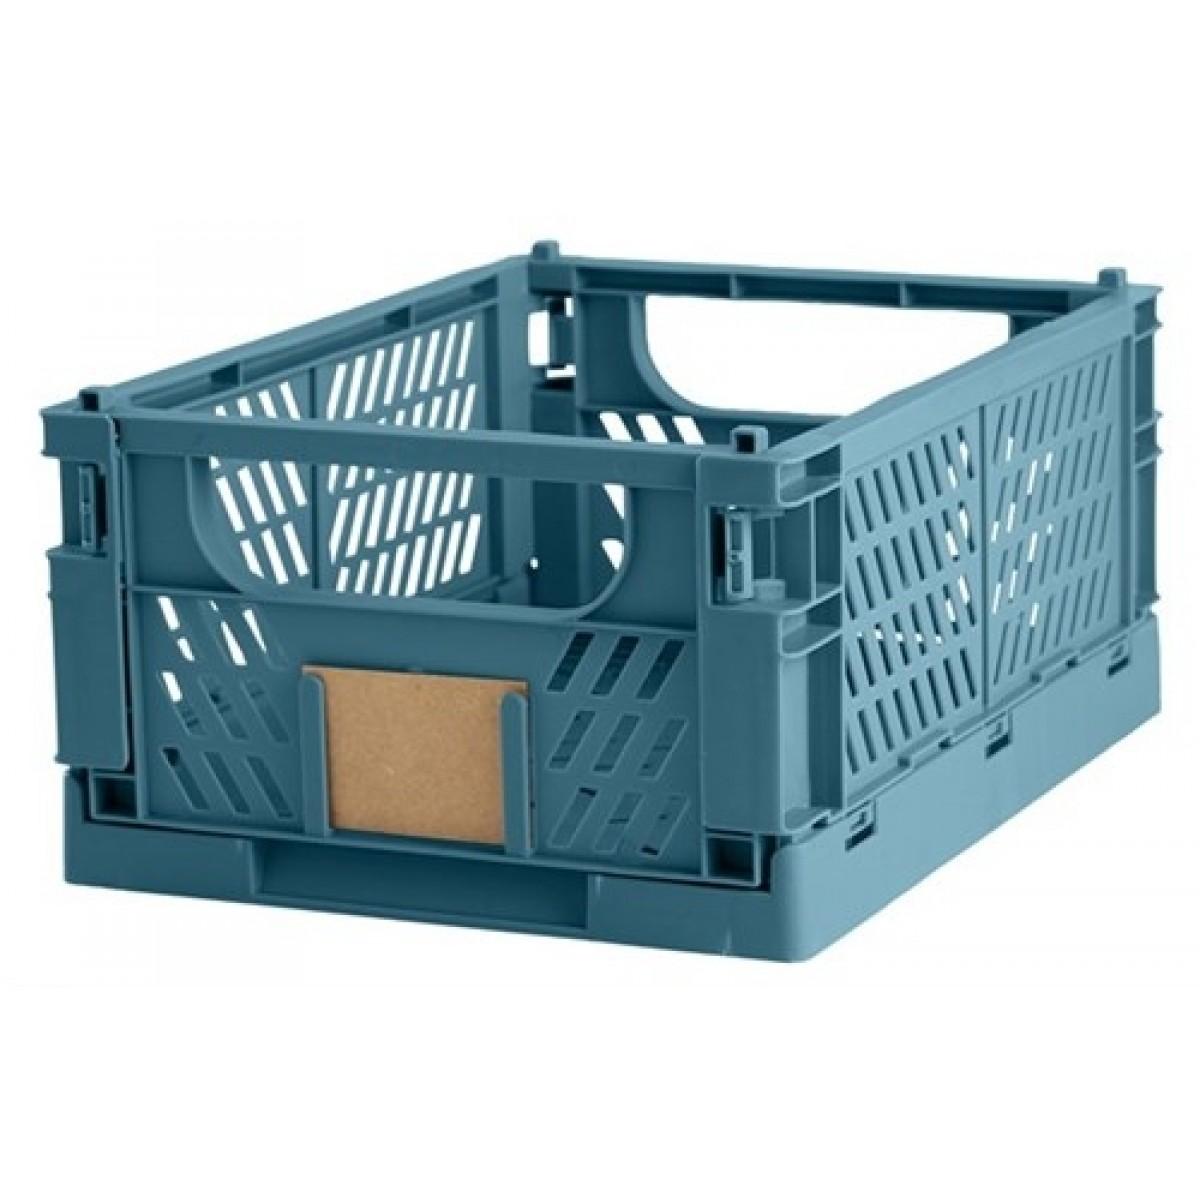 DAYOpbevaringskassefoldbar33x245x15cmtapestryblue-01